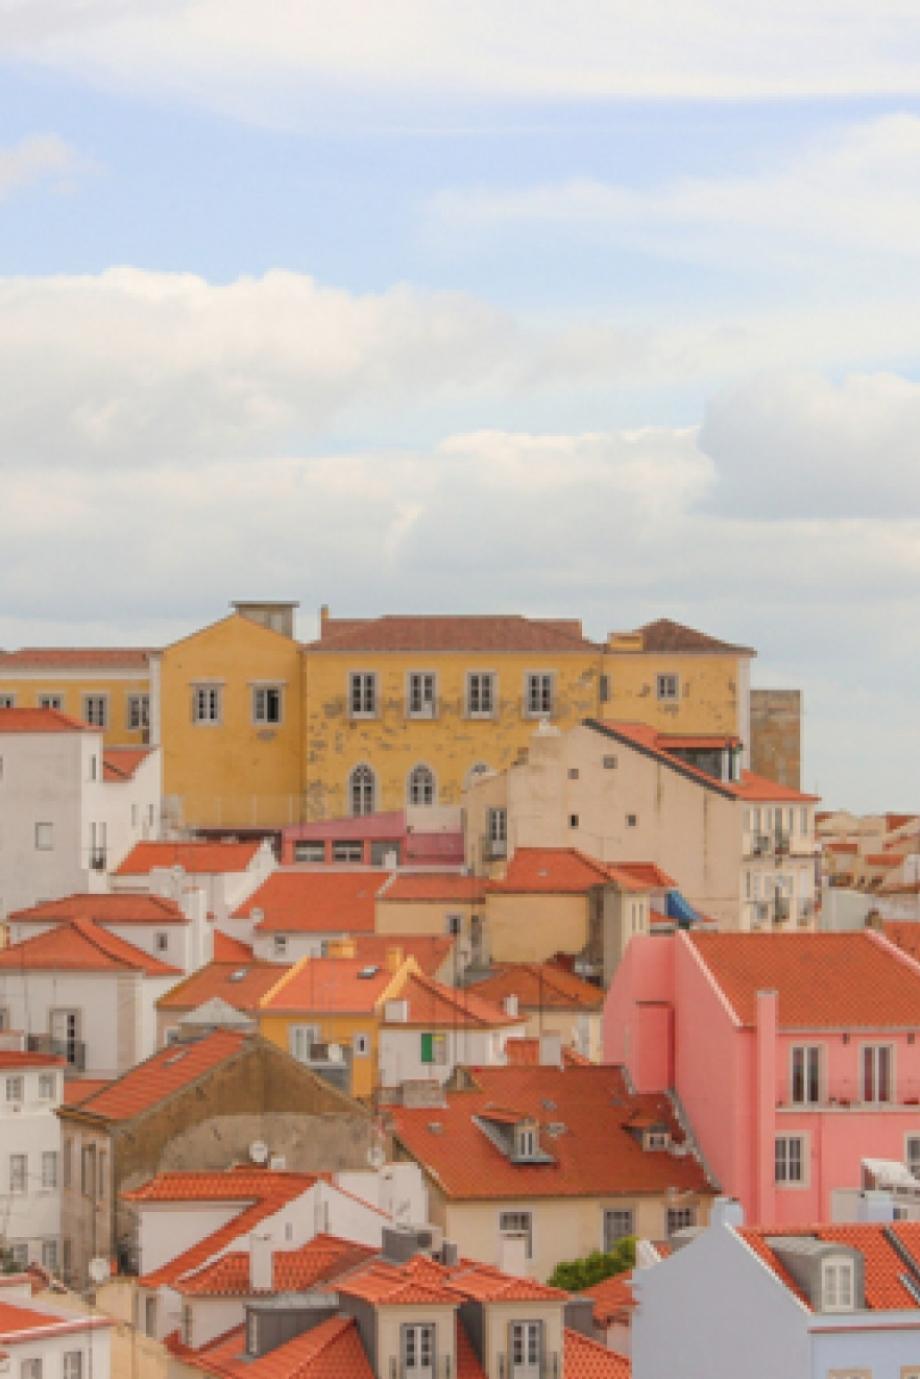 LisboaCool_Blog_5 UNMISSABLE EXPERIENCES IN LISBON